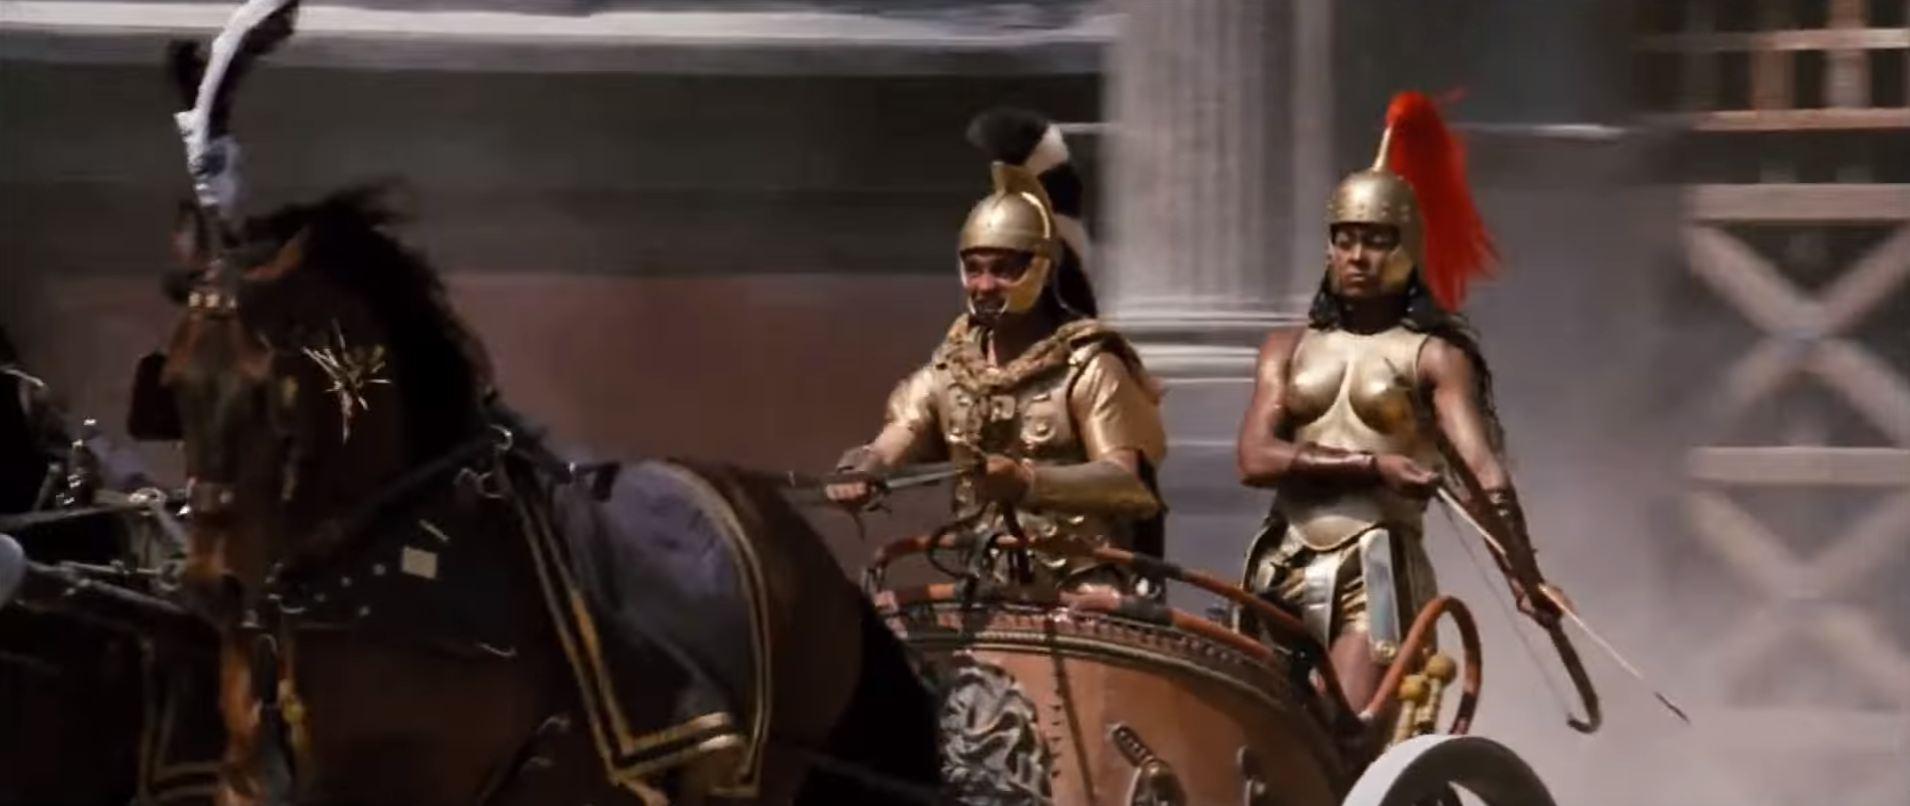 african-gladiator-13